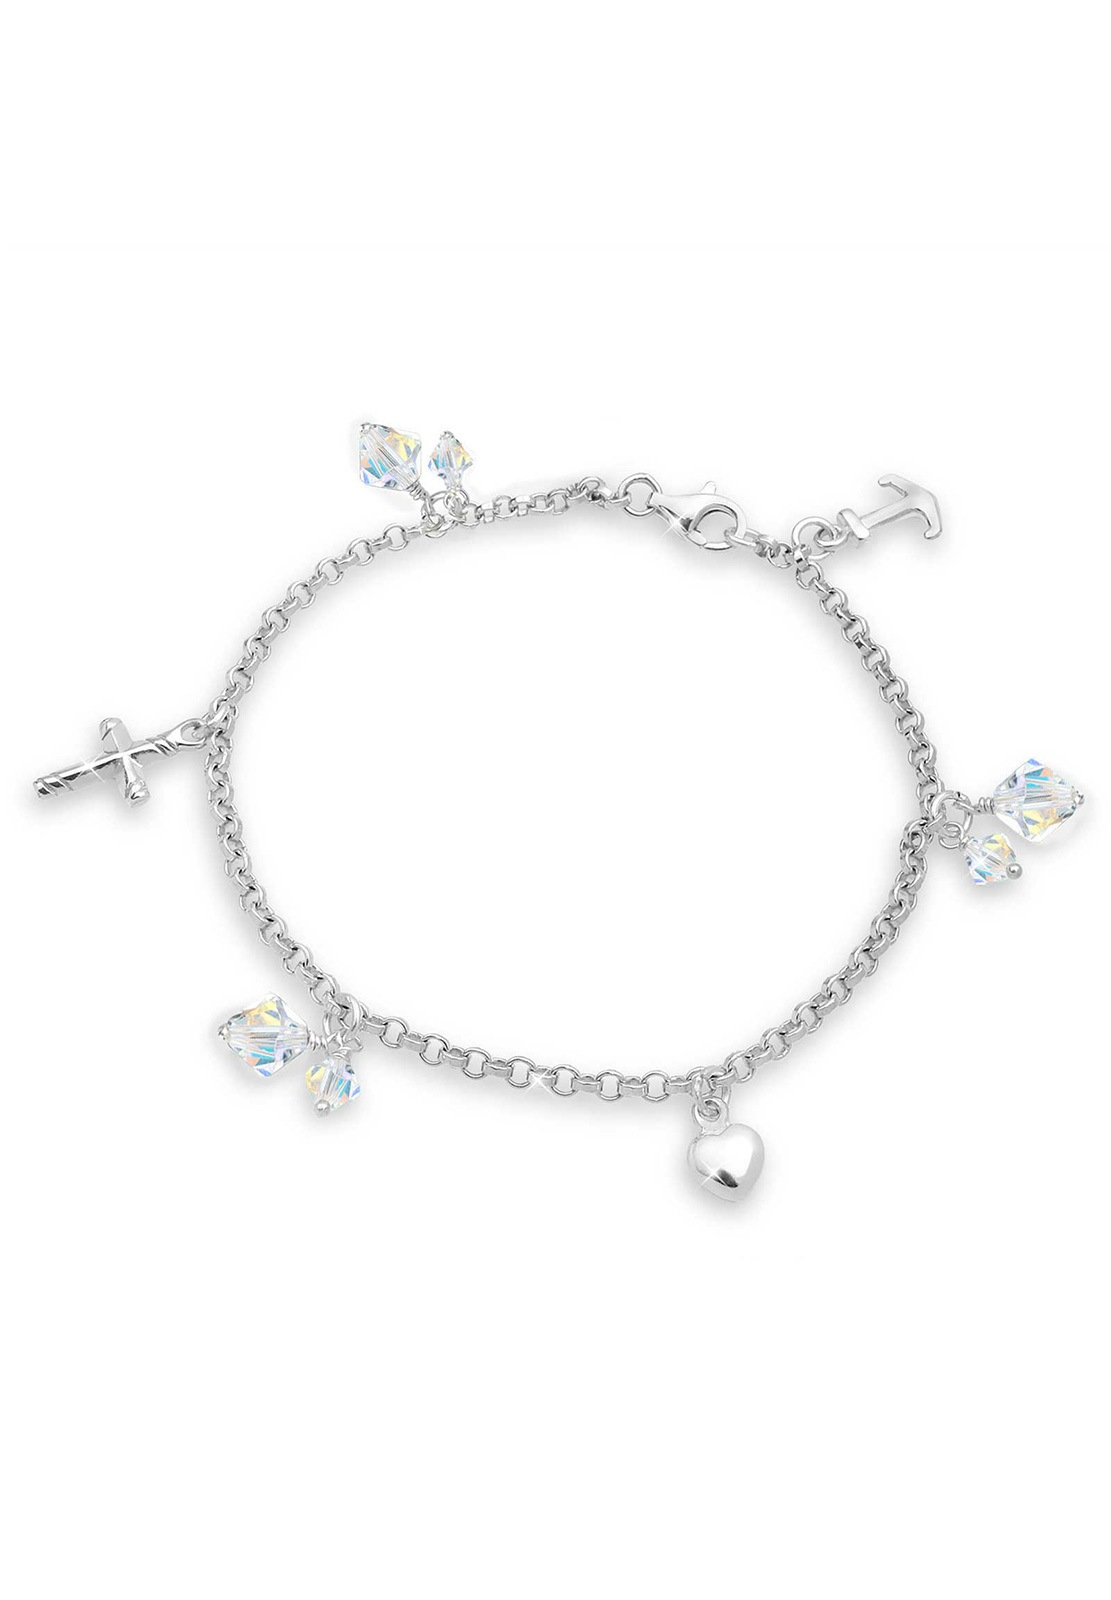 Elli Bettelarmband Kreuz Herz Anker Swarovski Kristalle Silber | Schmuck > Armbänder > Bettelarmbänder | Elli